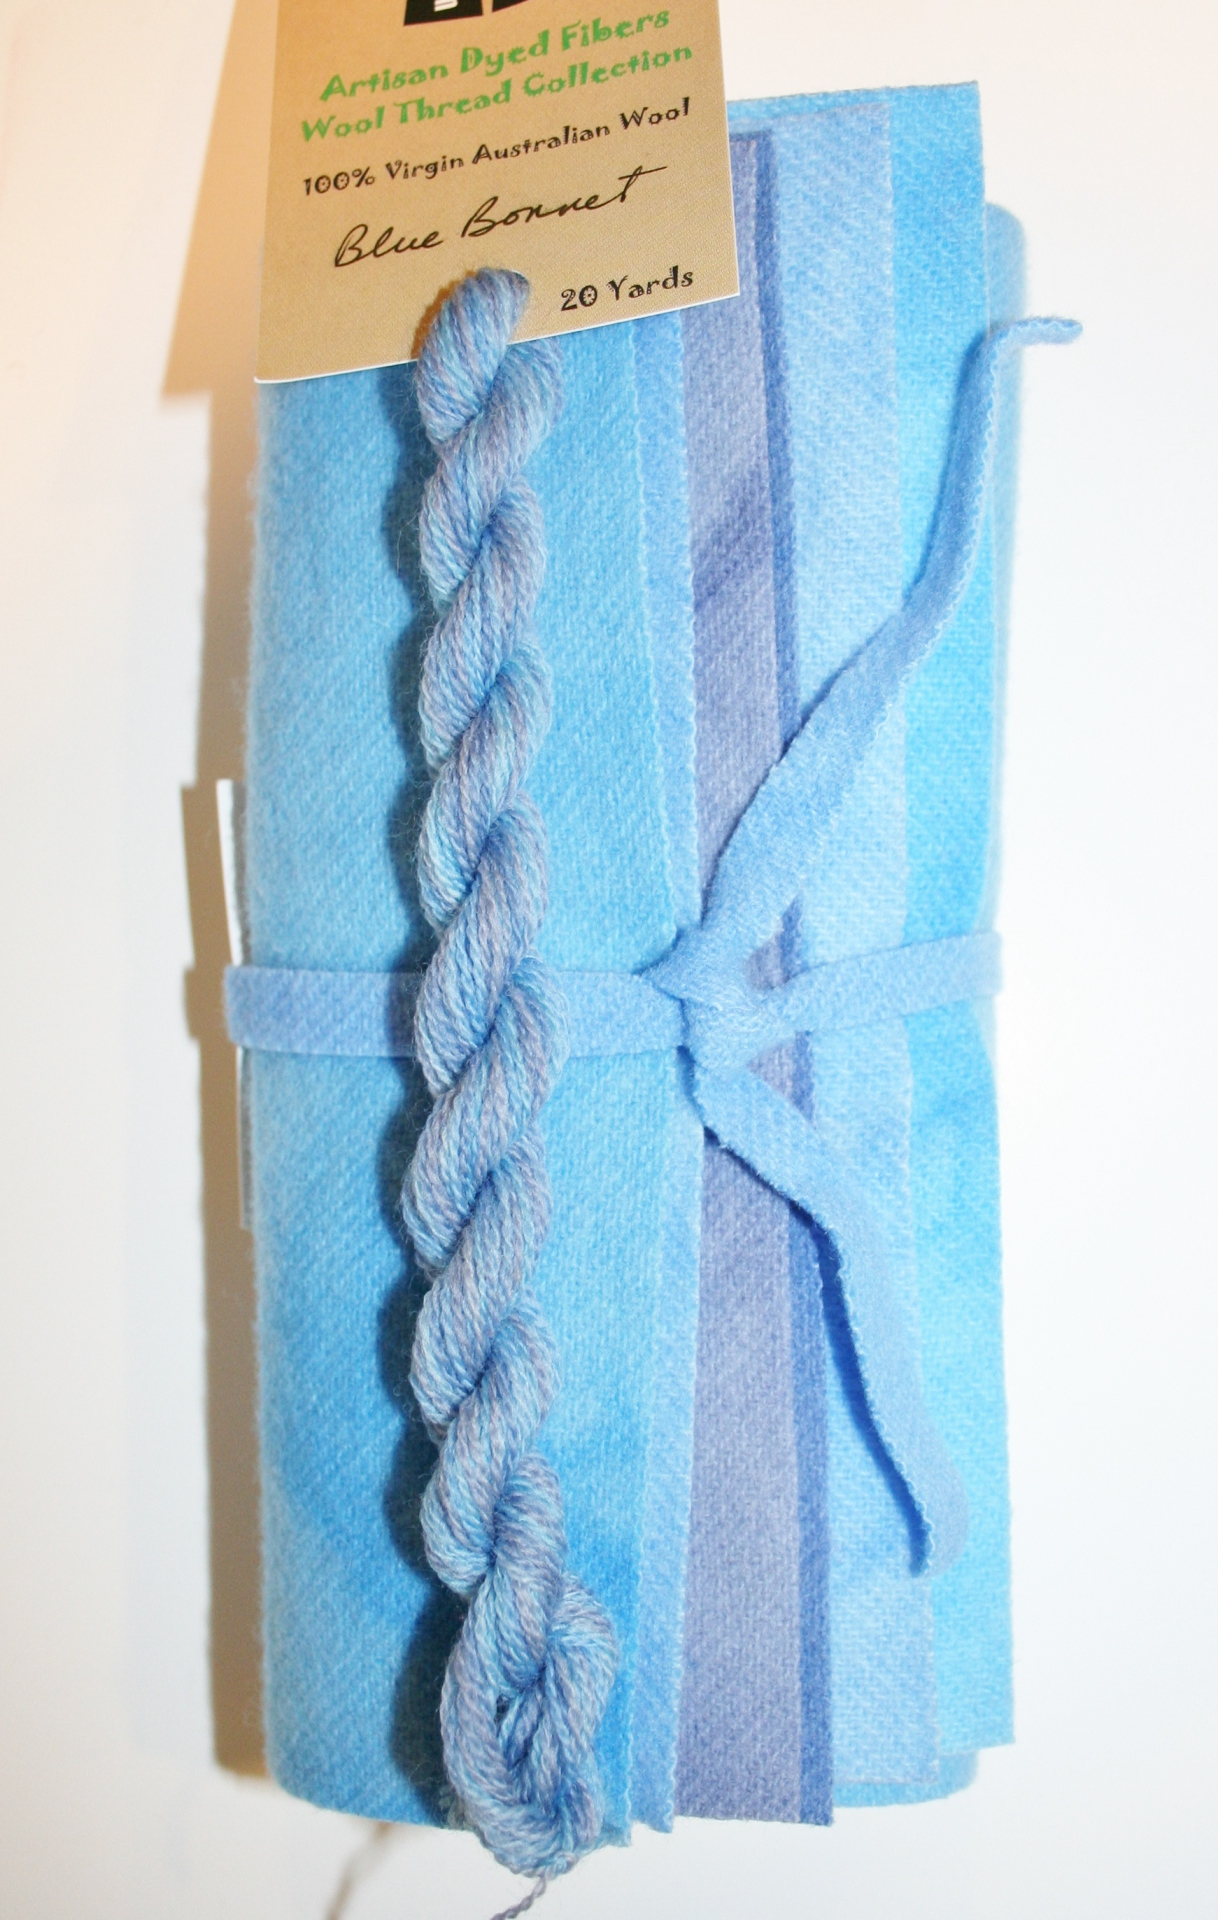 Blue Bonnet Hand Dyed Wool Six Pack light Blues to Medium Blues